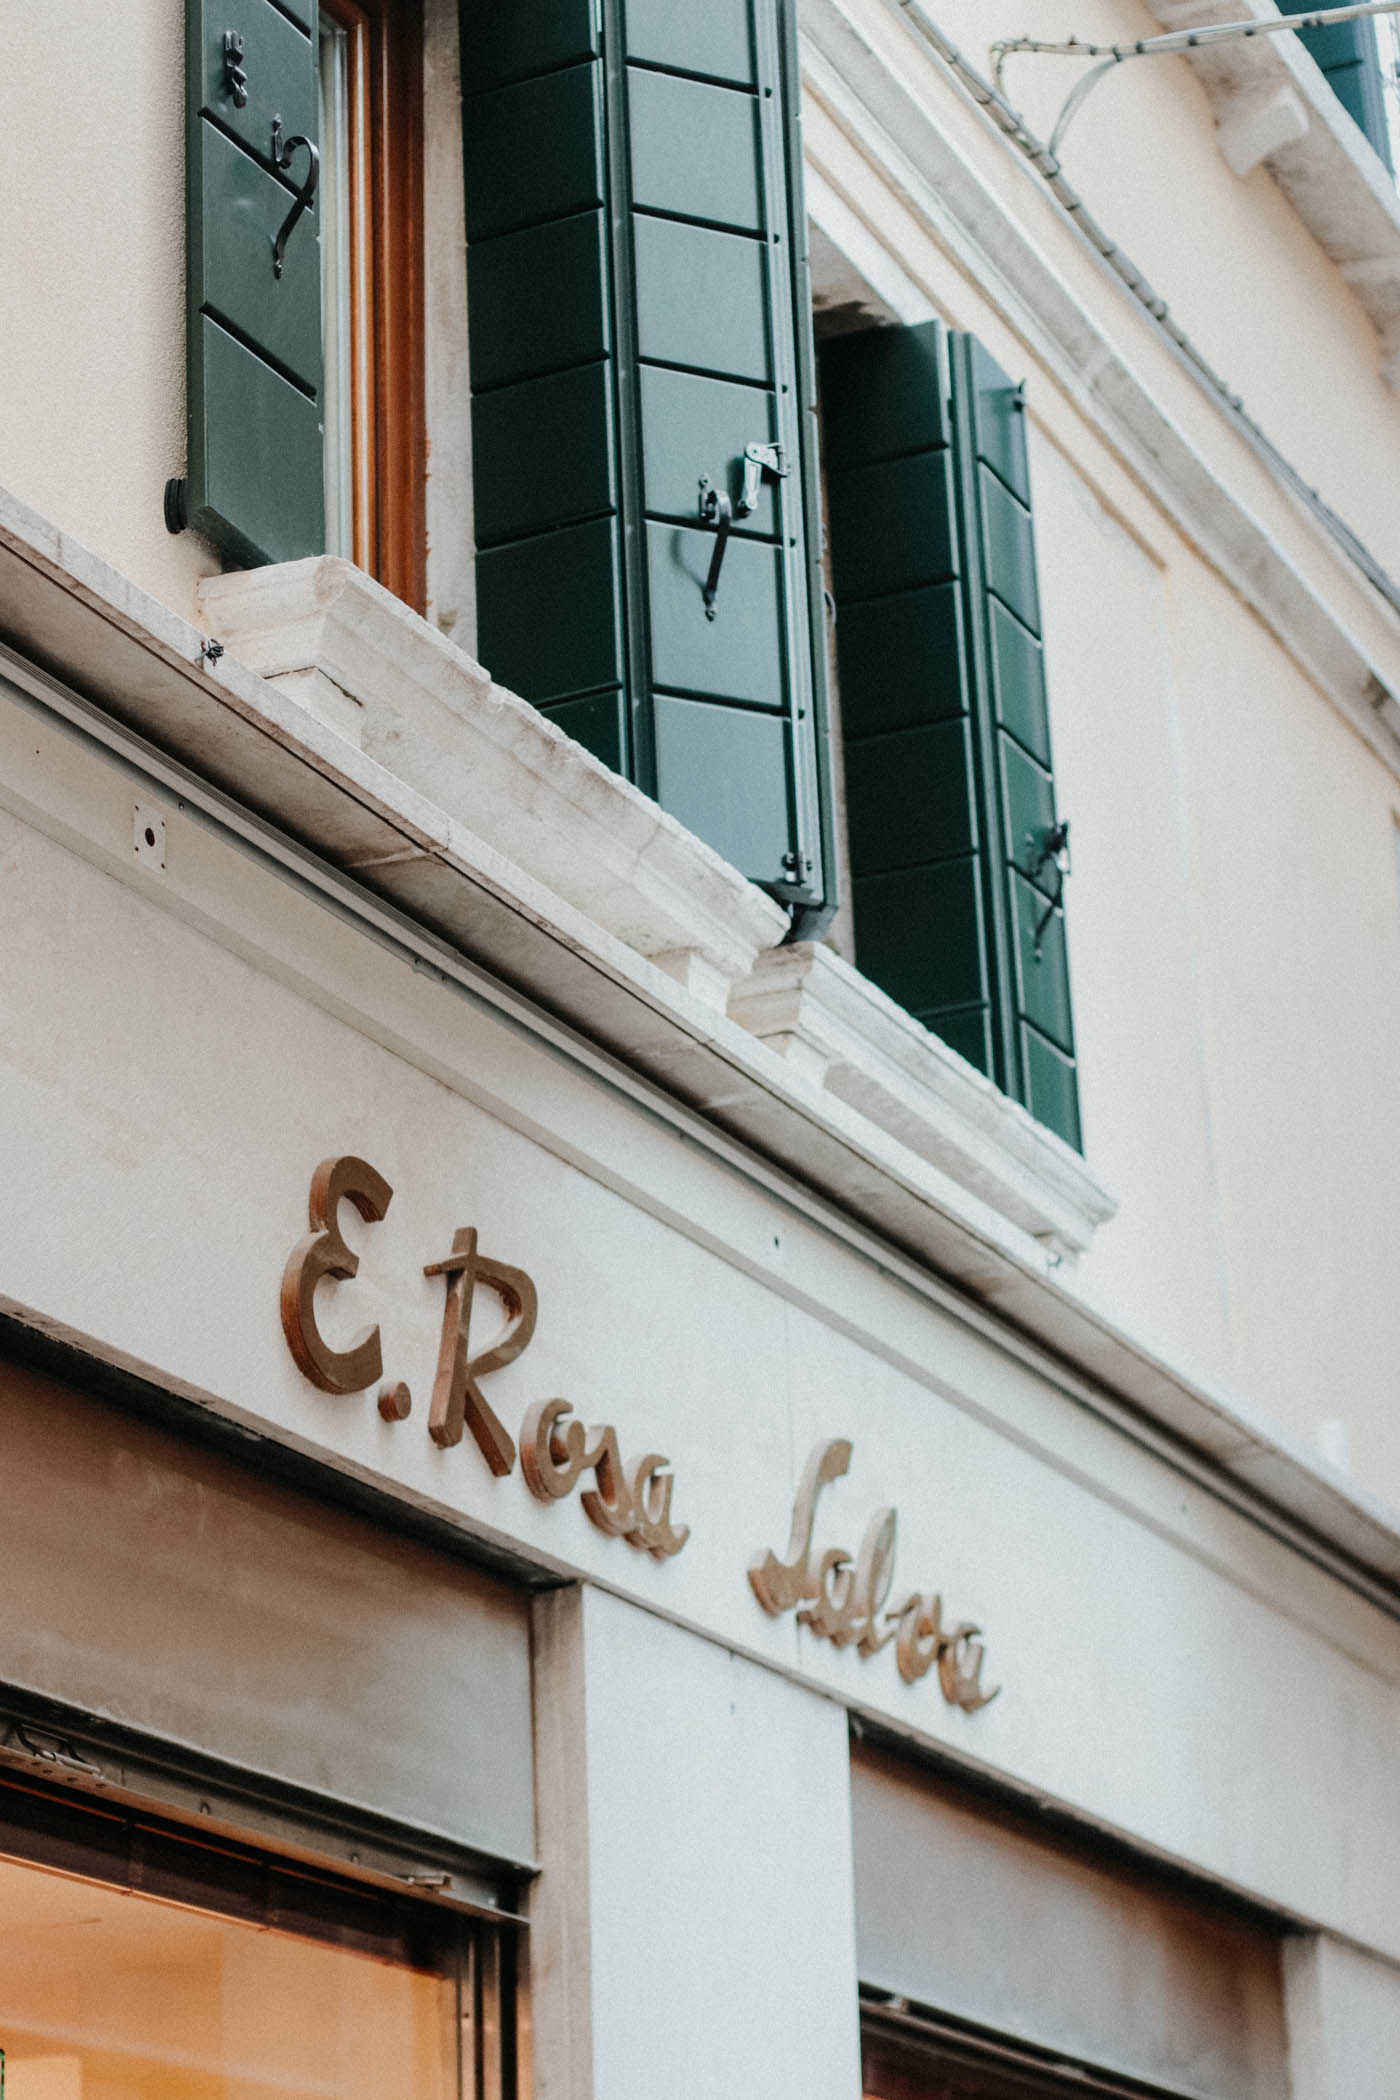 Venice Food Guide: Pasticceria Rosa Salva 32